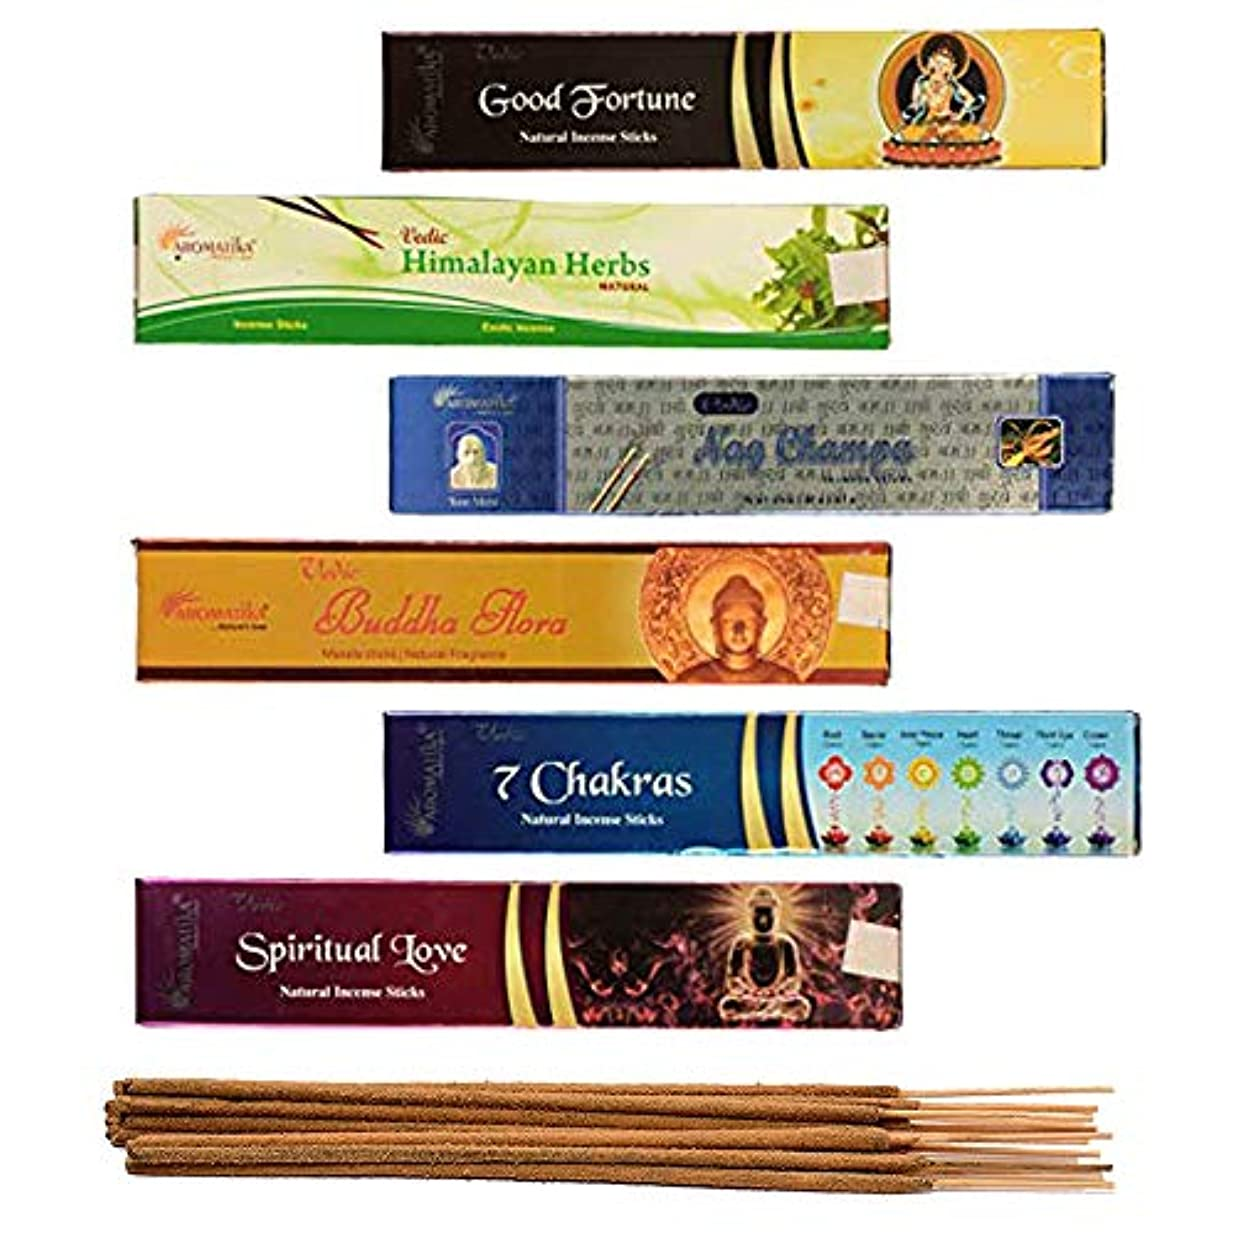 aromatika 6 Assorted Masala Incense Sticks Vedic Nag Champa、7チャクラ、ブッダFlora、Himalayanハーブ、Good Fortune、Spiritual...